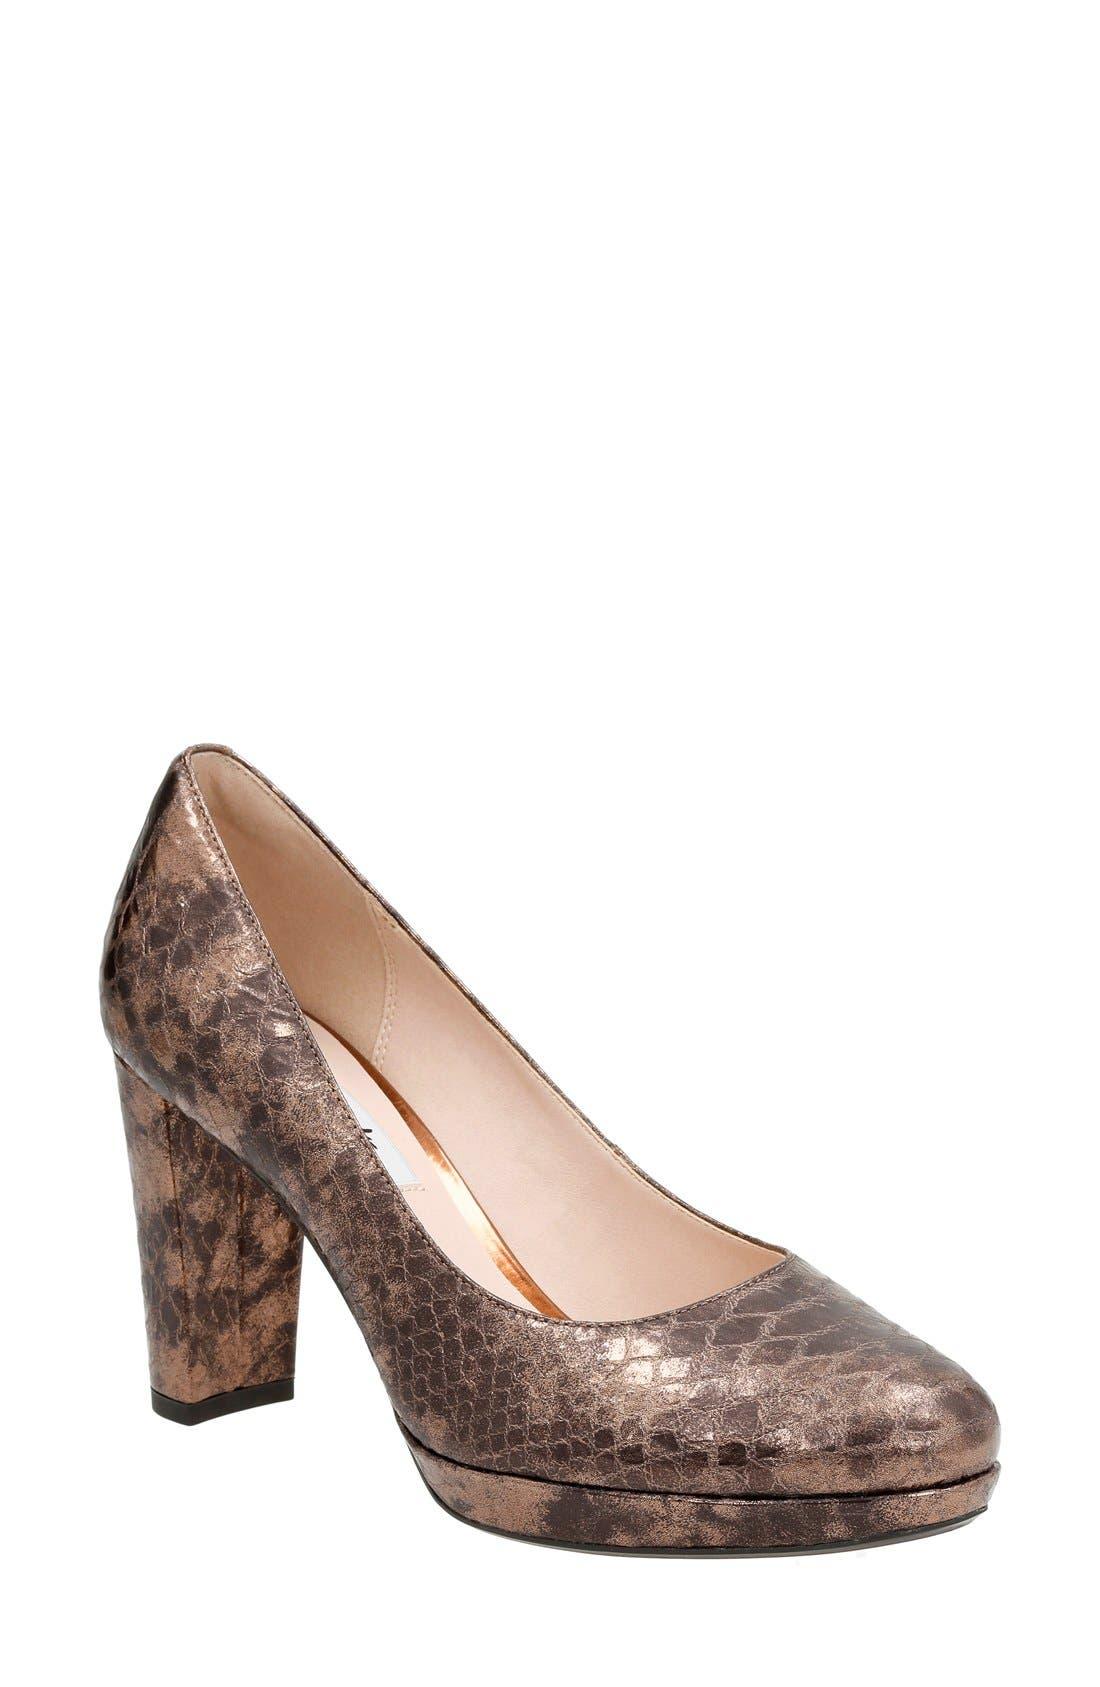 Kendra Sienna Almond Toe Pump,                         Main,                         color, Bronze Snake Leather